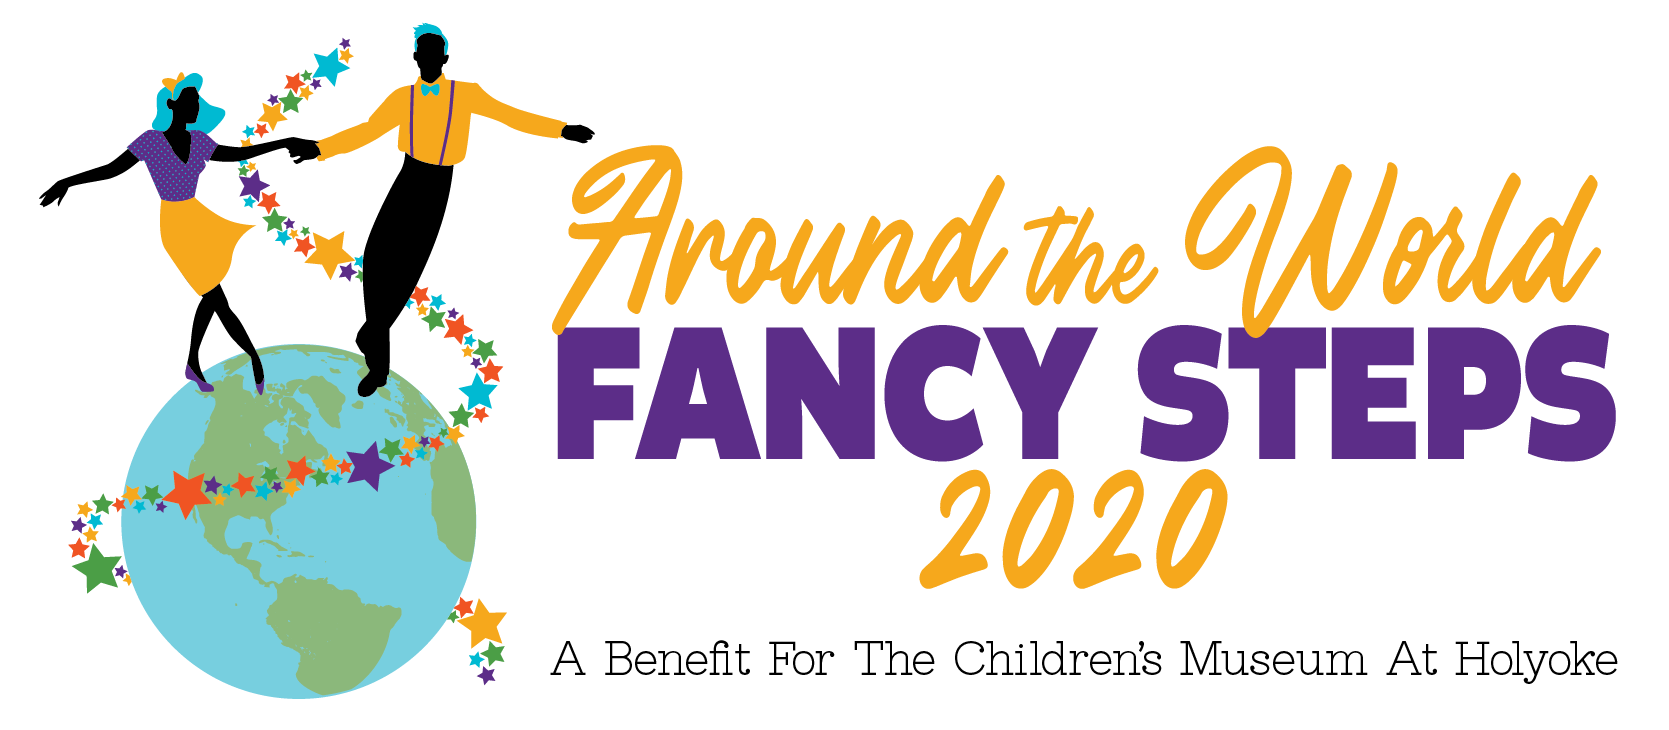 Around The World - Fancy Steps 2020